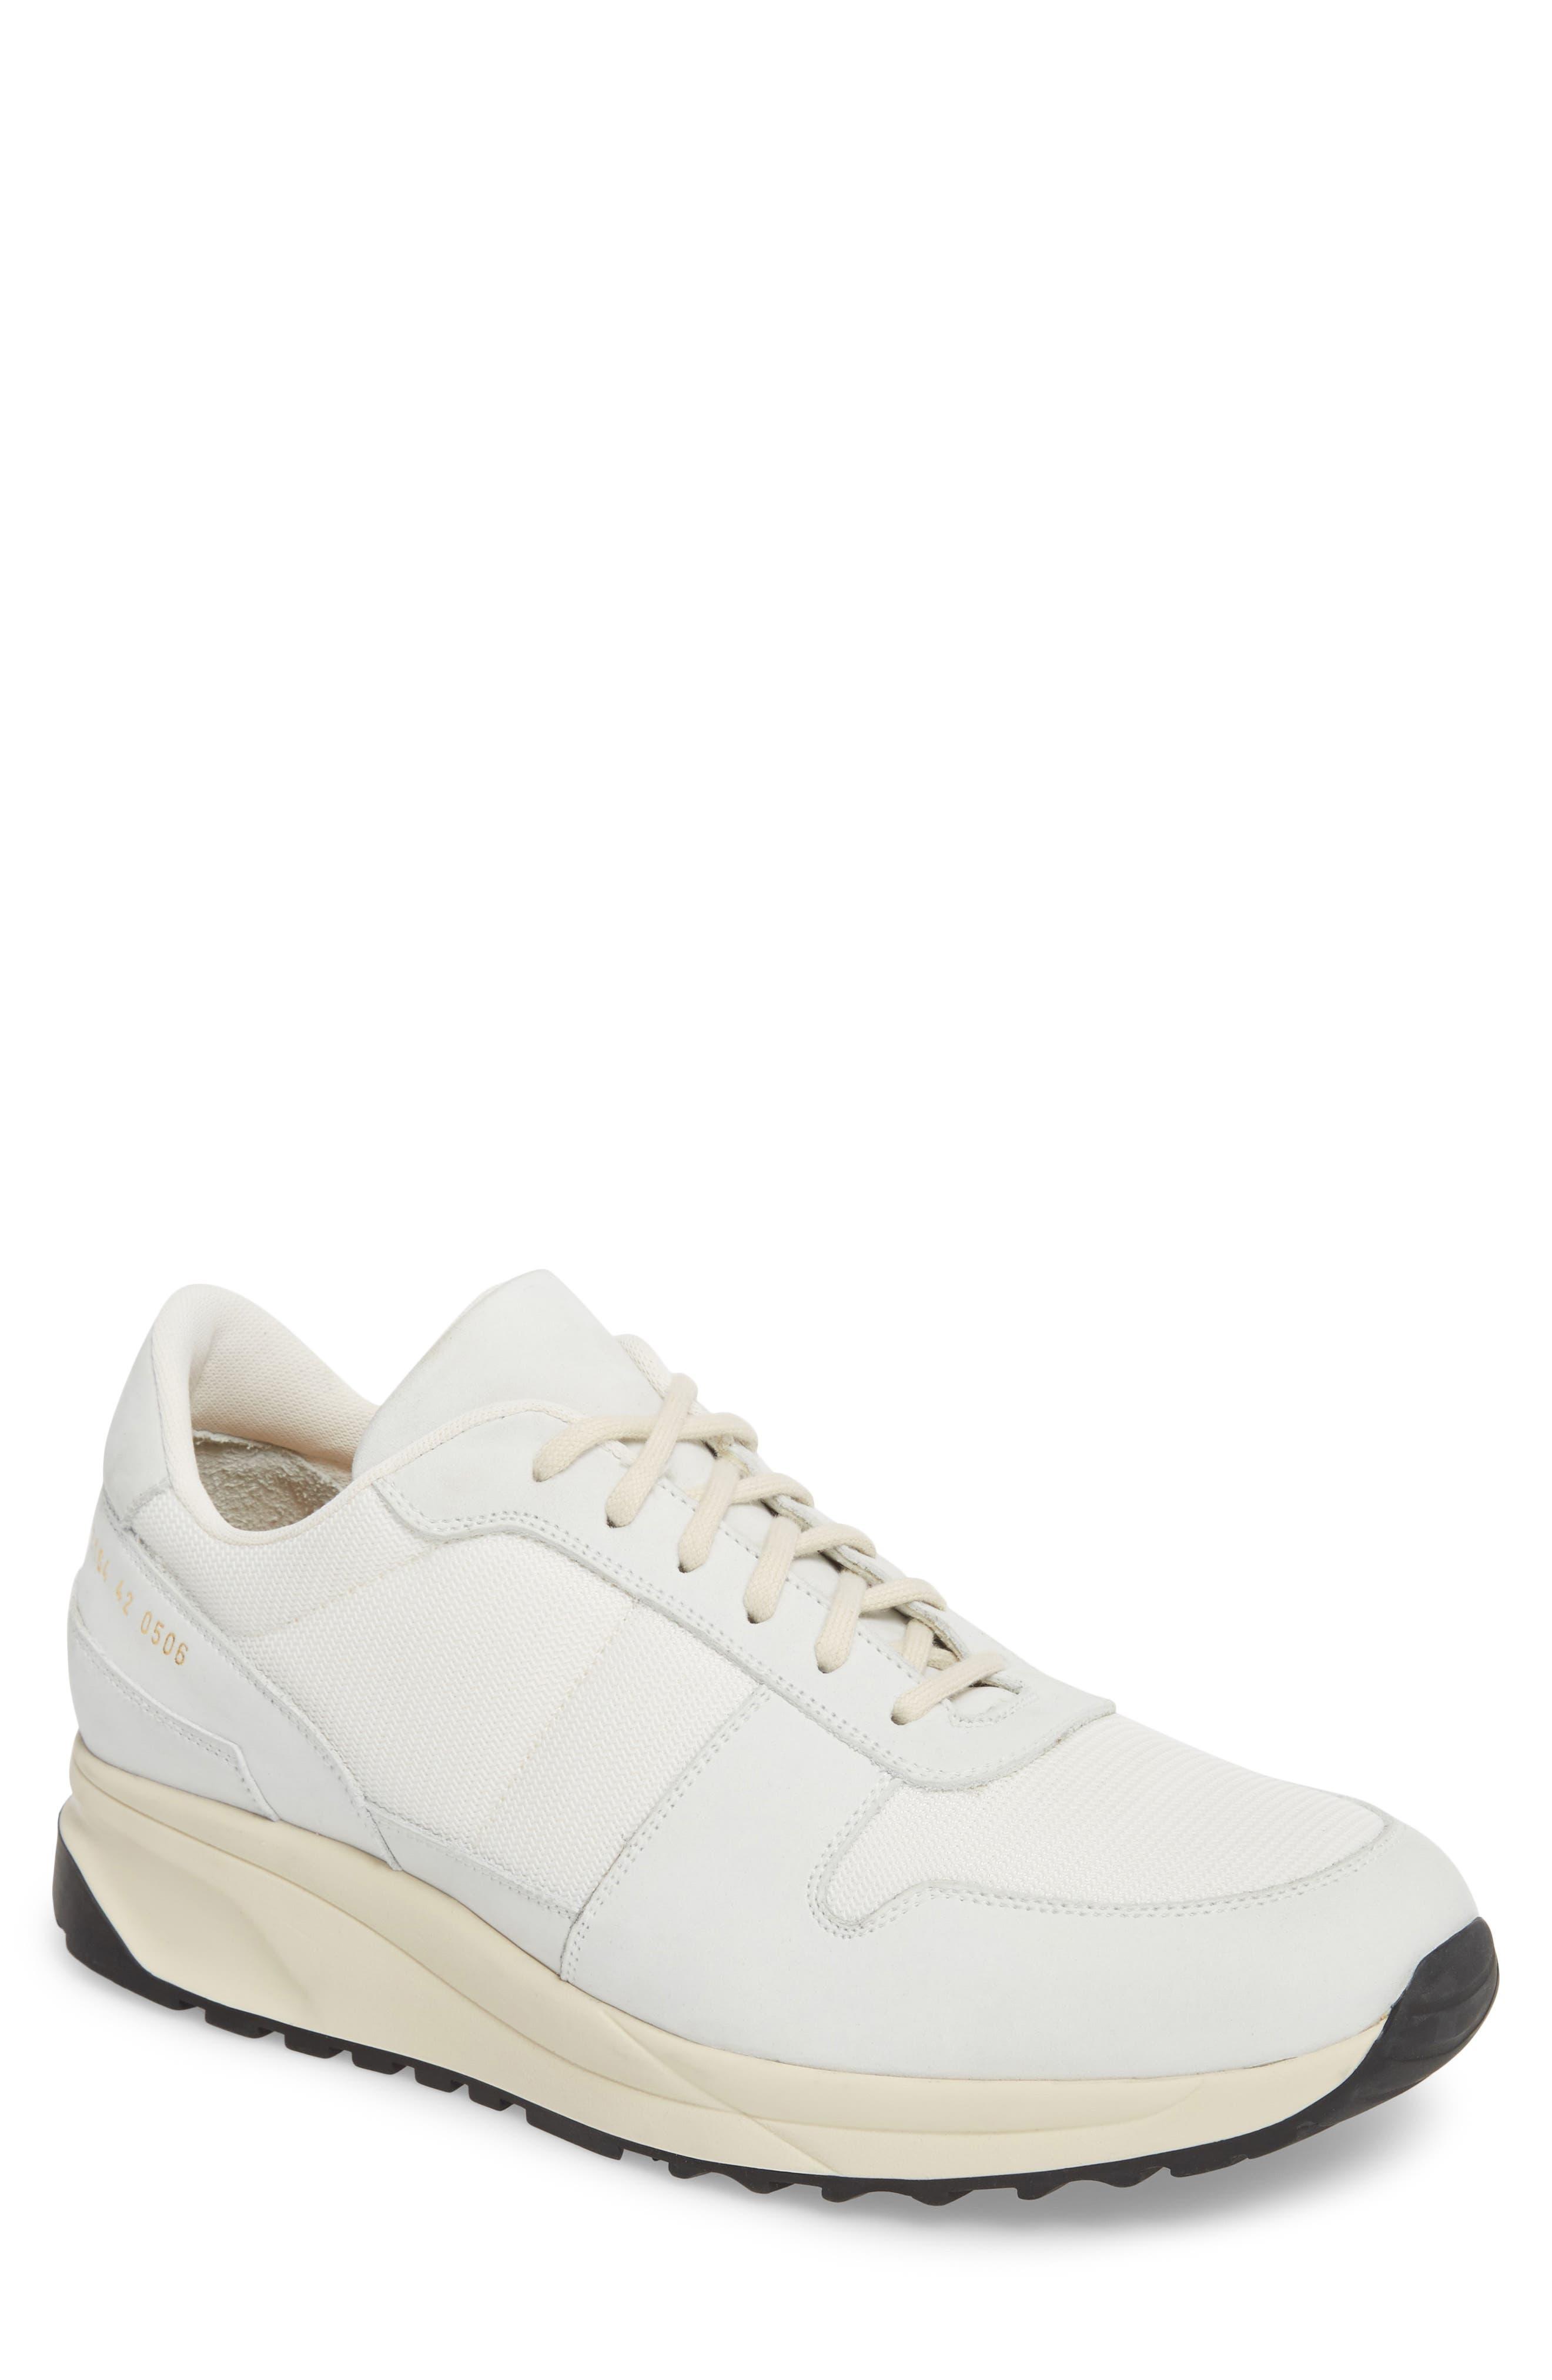 Track Vintage Sneaker,                             Main thumbnail 1, color,                             WHITE